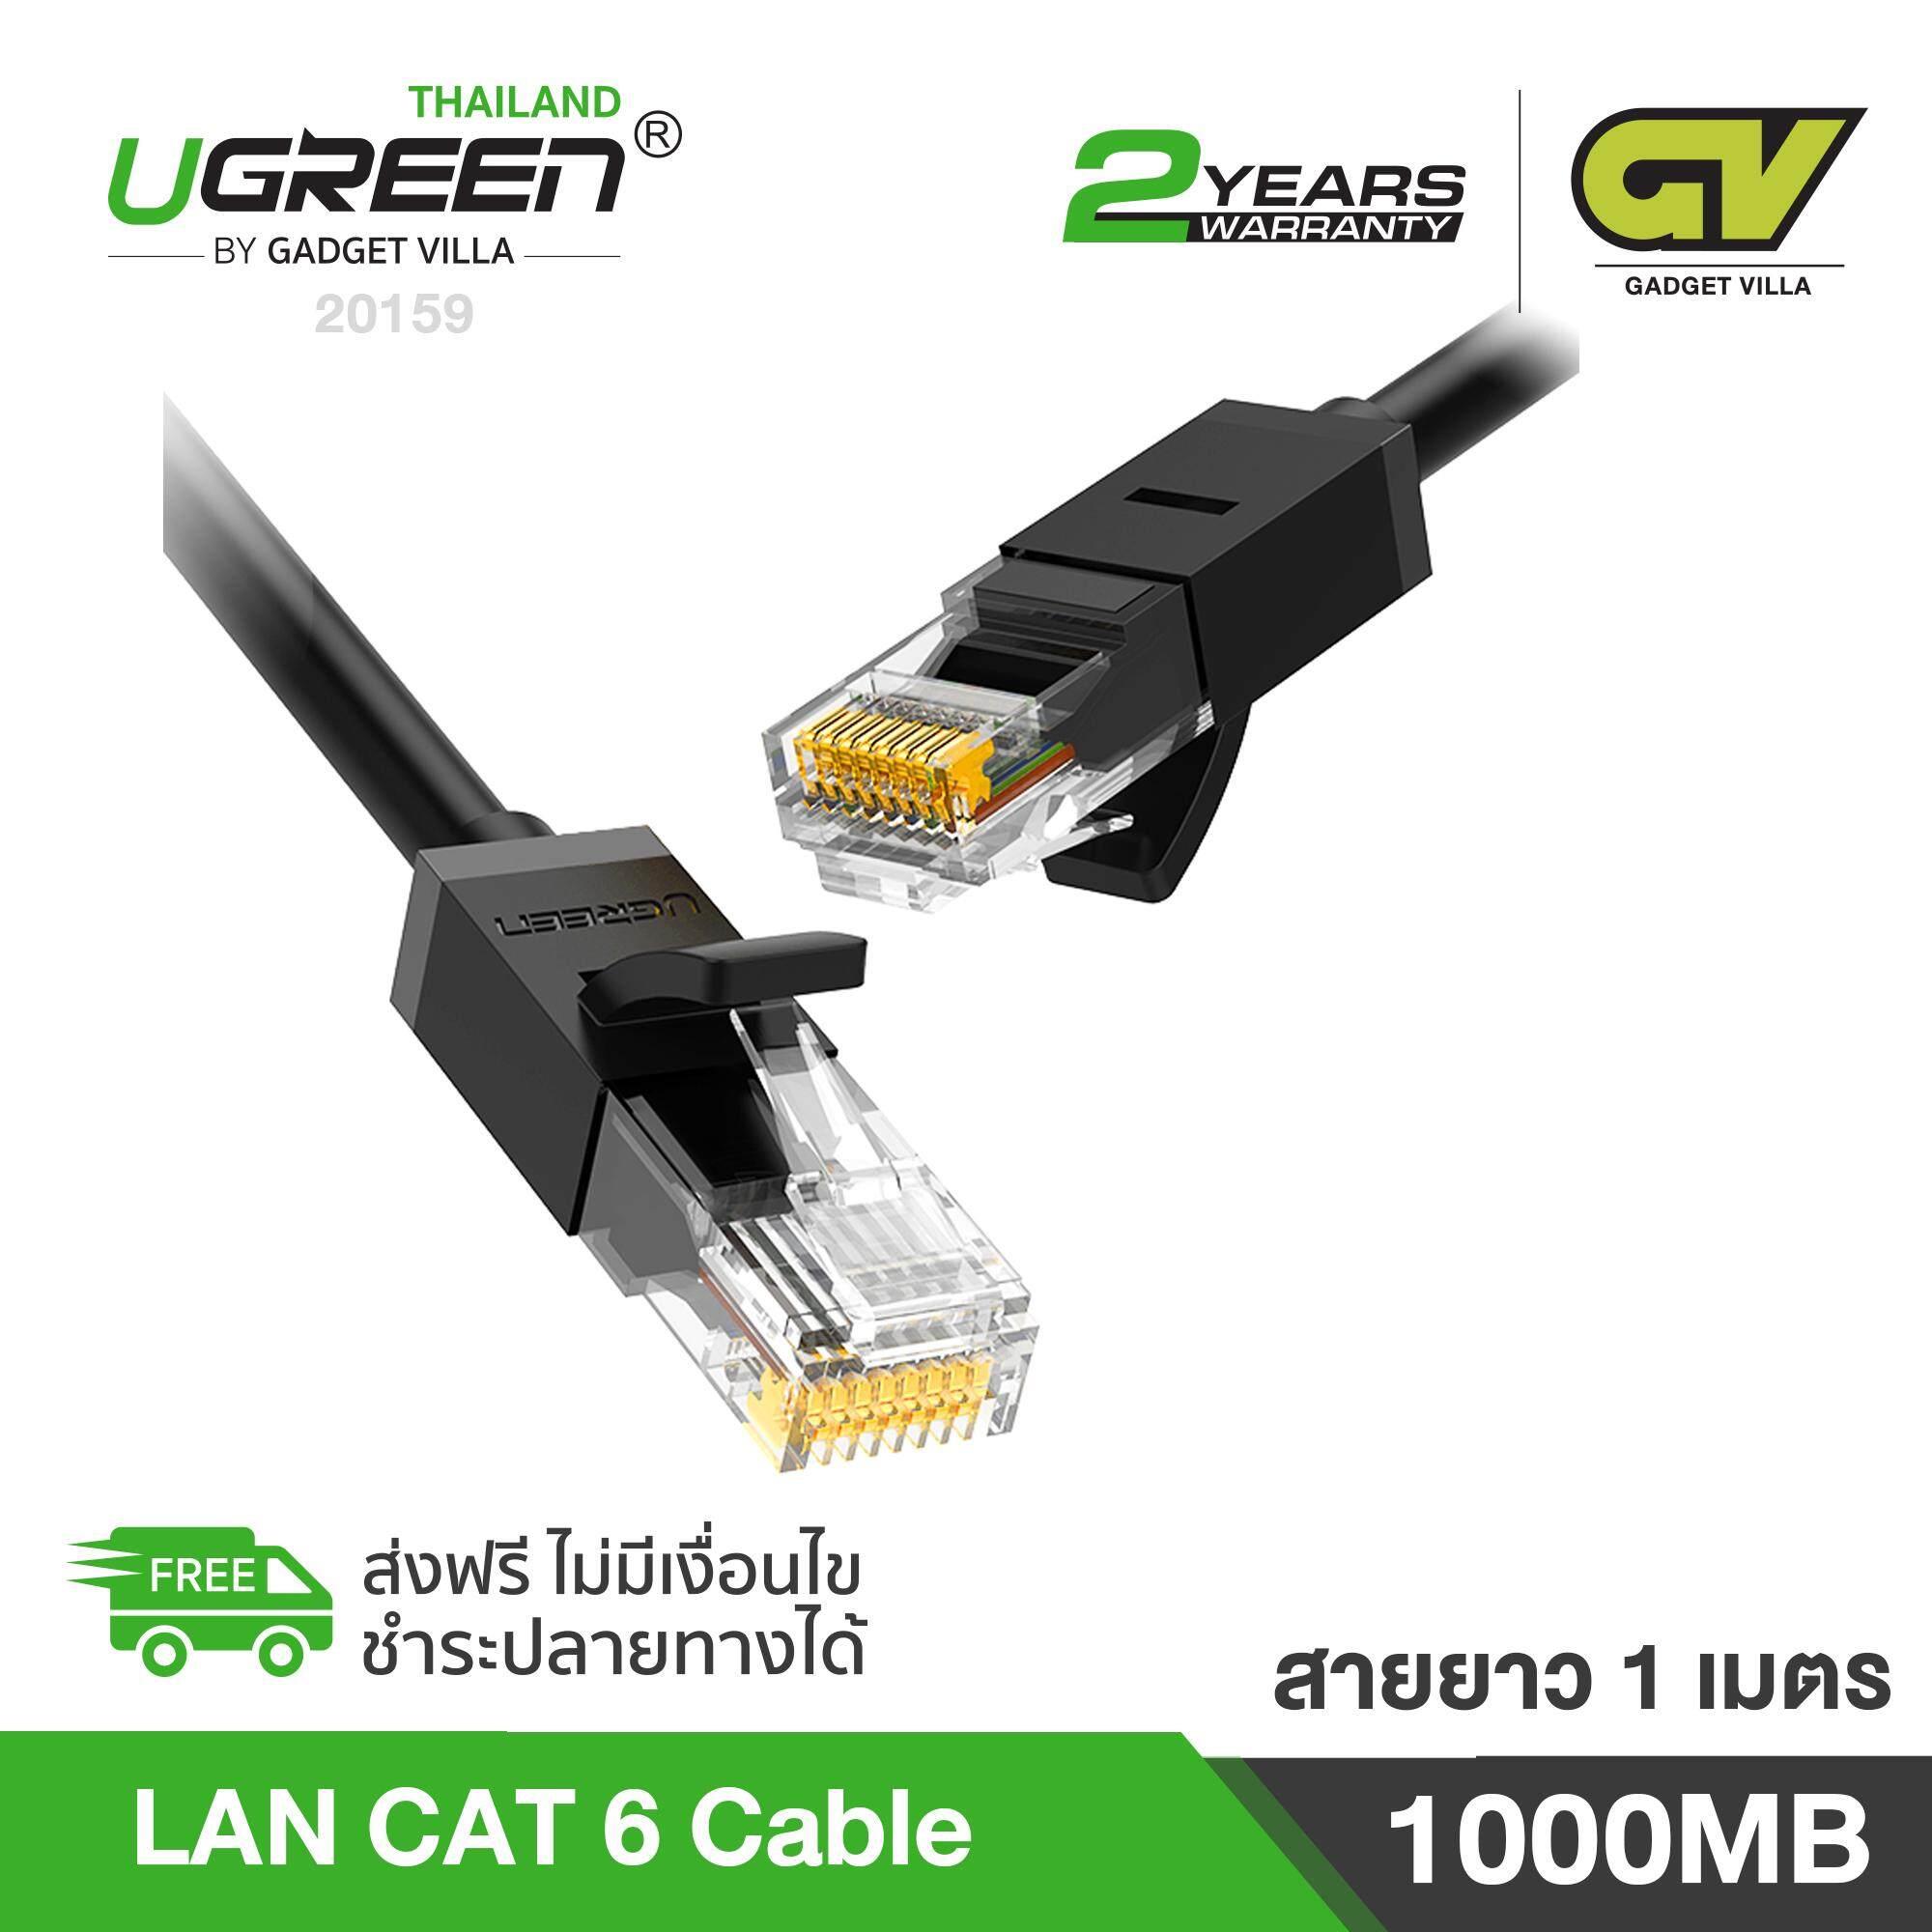 Ugreen สายแลน Cat6 Lan Cat6 Ethernet Cable รุ่น 20158 ยาว 50cm, 20159 ยาว 1m, 20160 ยาว 2m, 20161 ยาว 3m, 20162 ยาว 5m, 20164 ยาว 10m, 20165 ยาว 15m, 20166 ยาว 20m Gigabit Rj45 Network Lan Cable For Mac, Computer, Pc รองรับ 1000mb.